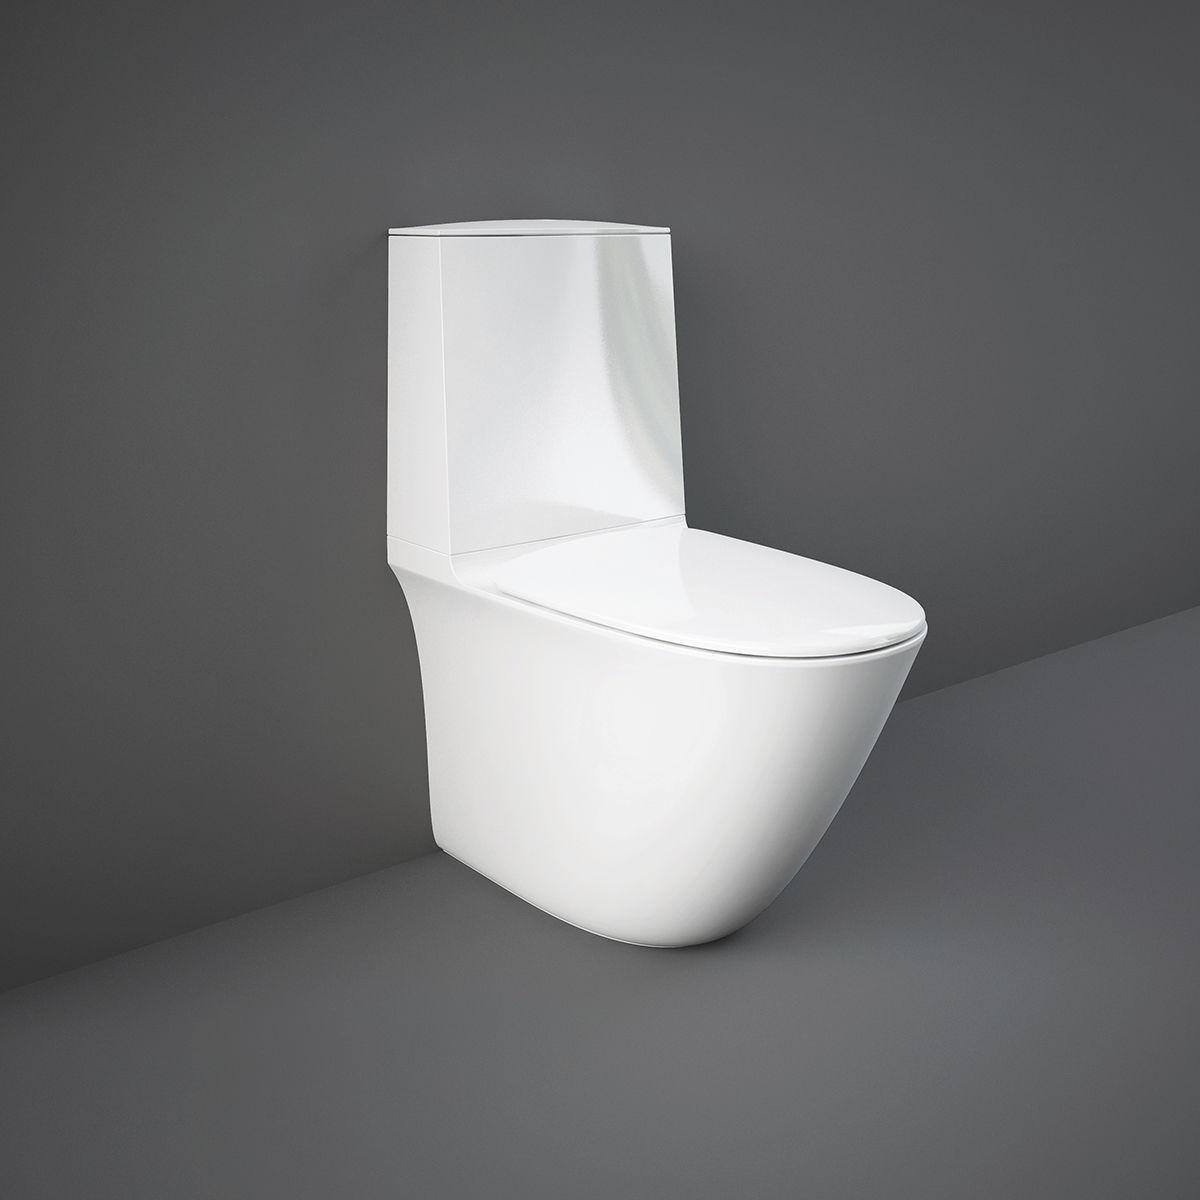 Free Standing Toilet Ceramic With Low Tank Rimless Rak